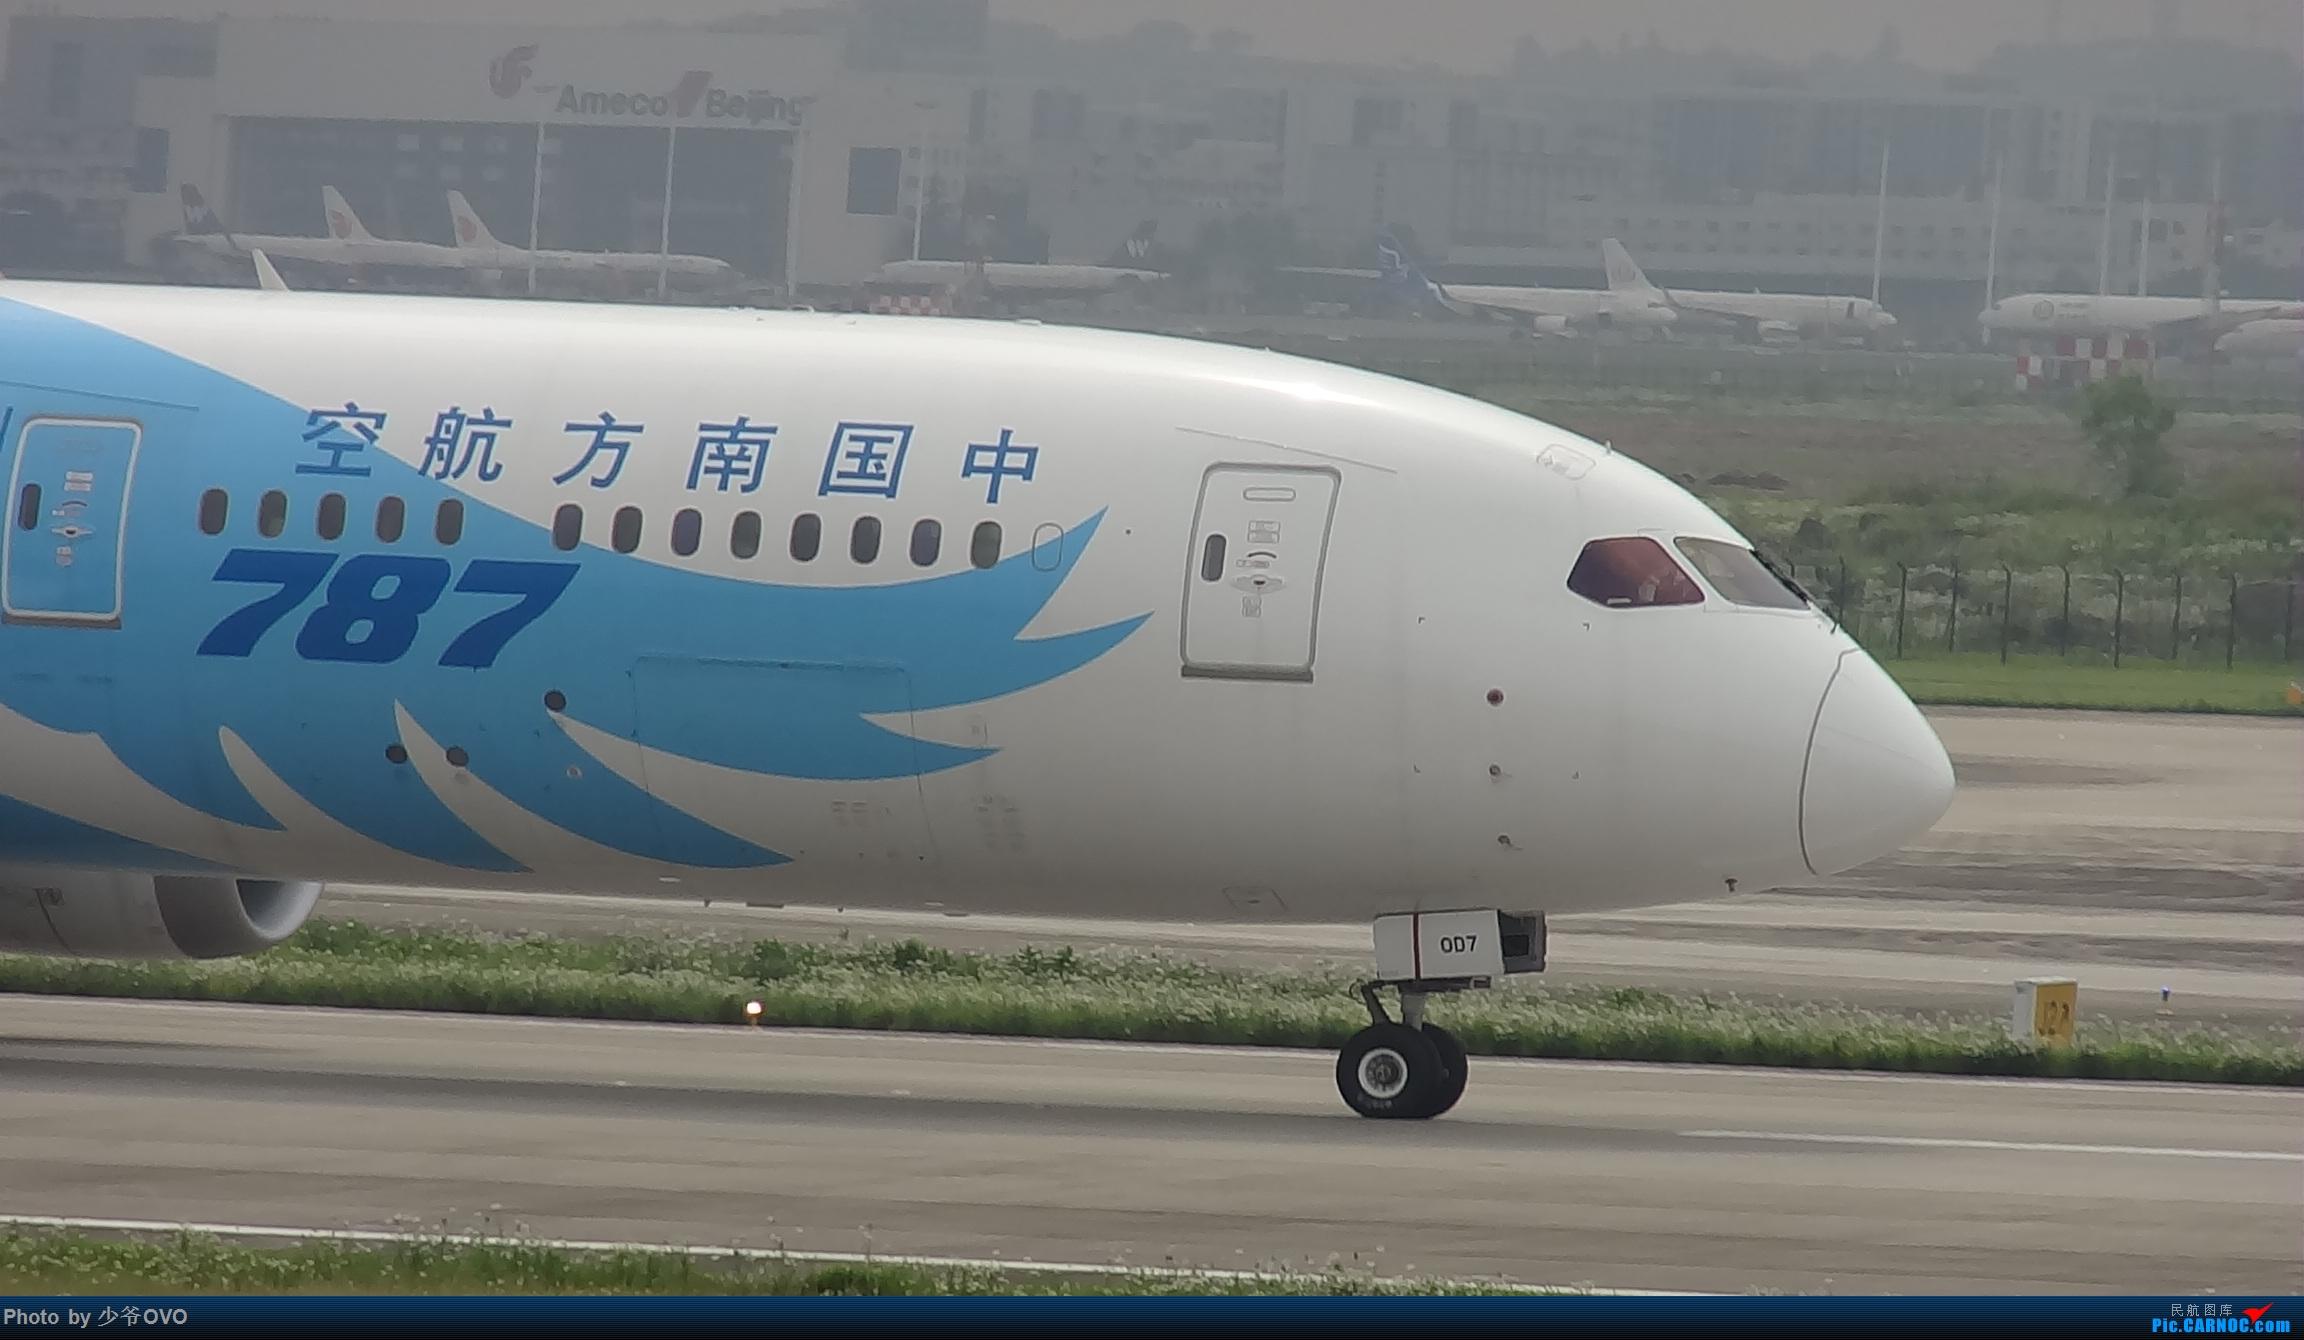 Re:[原创]CKG重庆江北机场拍机,国航744,B-2447,和一群大佬拍机 BOEING 787-9 B-20D7 中国重庆江北国际机场